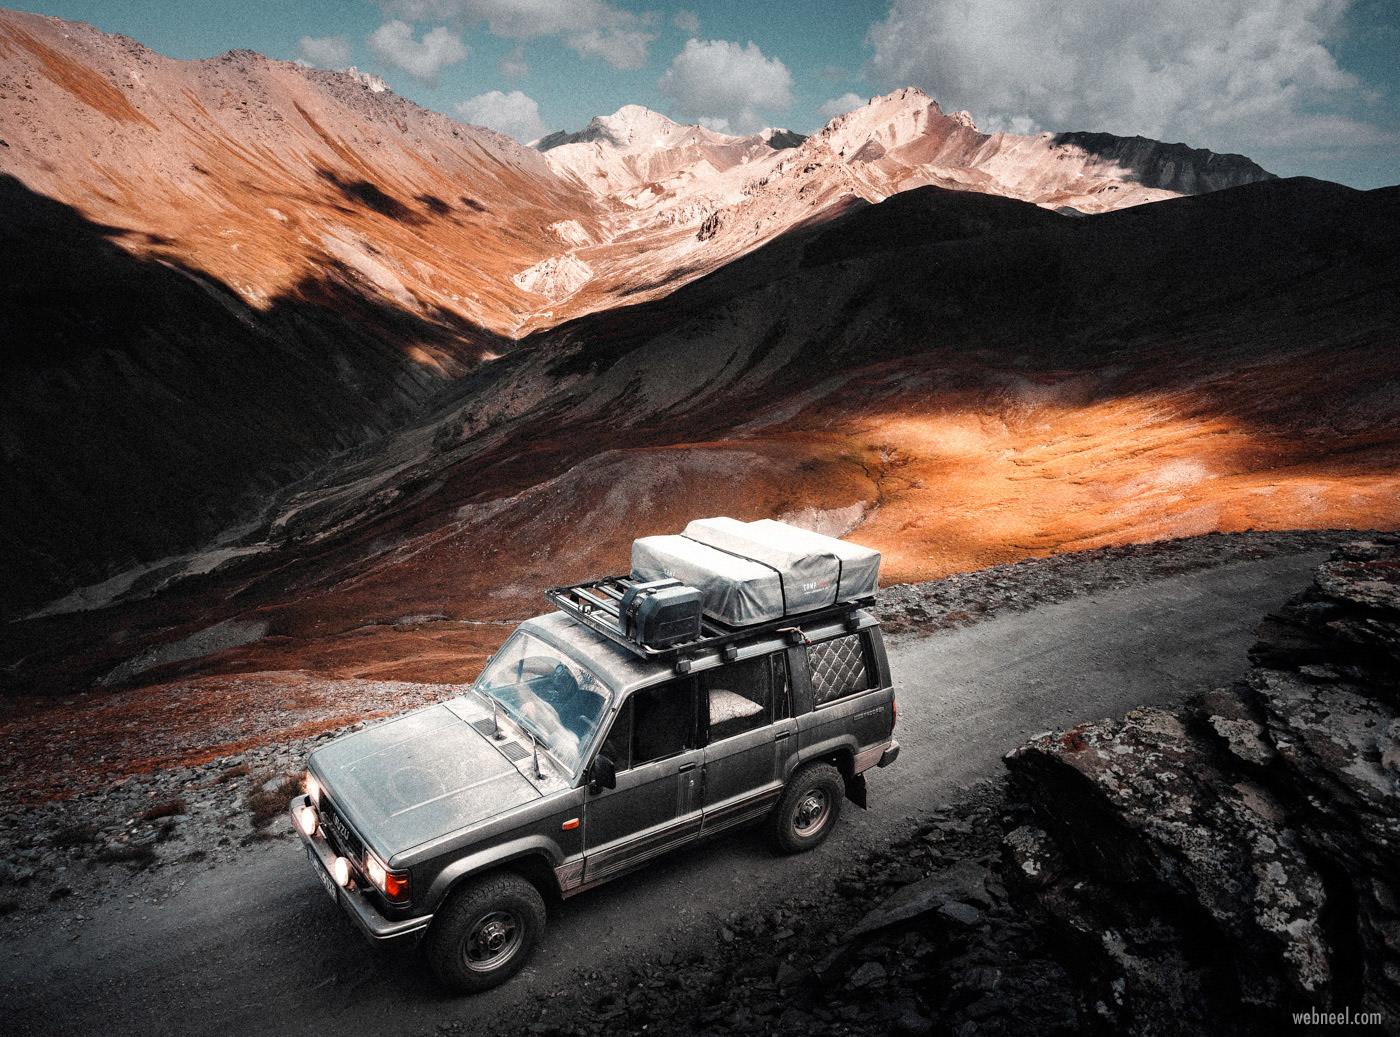 travel photography by hofschulz schoppa